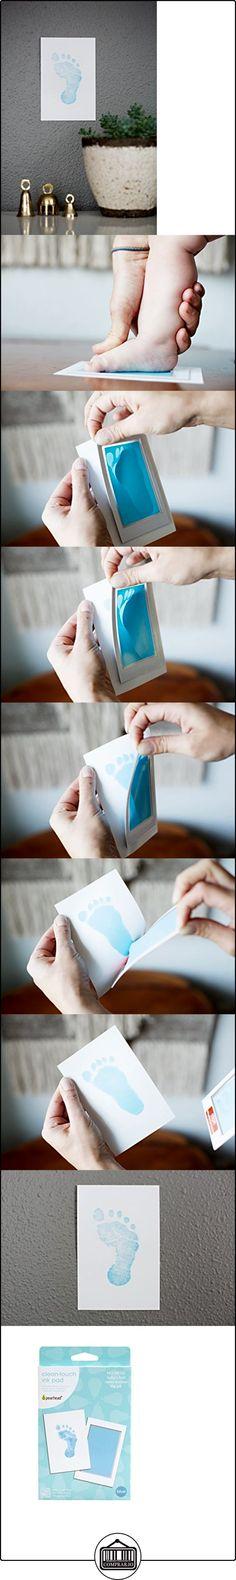 Pearhead Newborn Baby Handprint or Footprint Clean-Touch Ink Pad, 2 Uses, Blue by Pearhead  ✿ Regalos para recién nacidos - Bebes ✿ ▬► Ver oferta: http://comprar.io/goto/B019MOL7OW